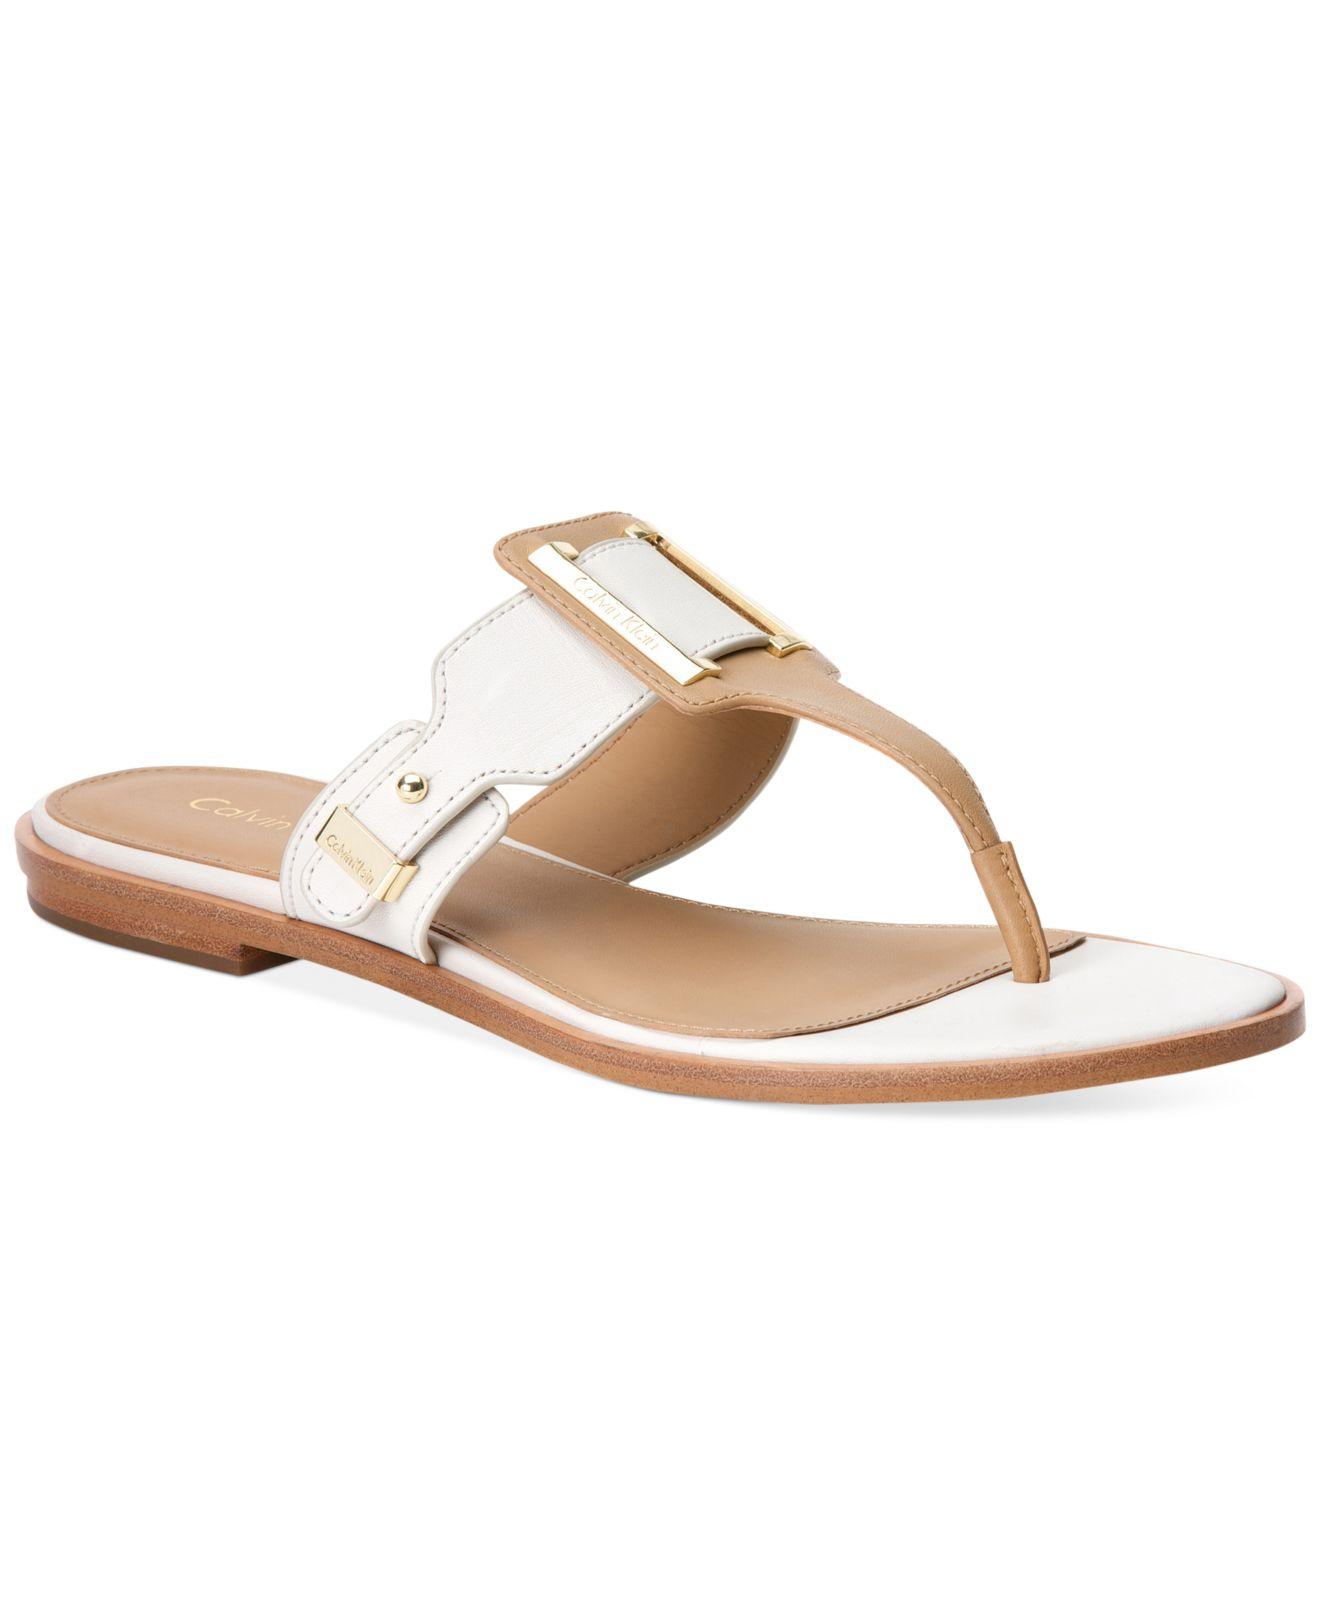 Ula Buckle Thong Sandals in Metallic - Lyst